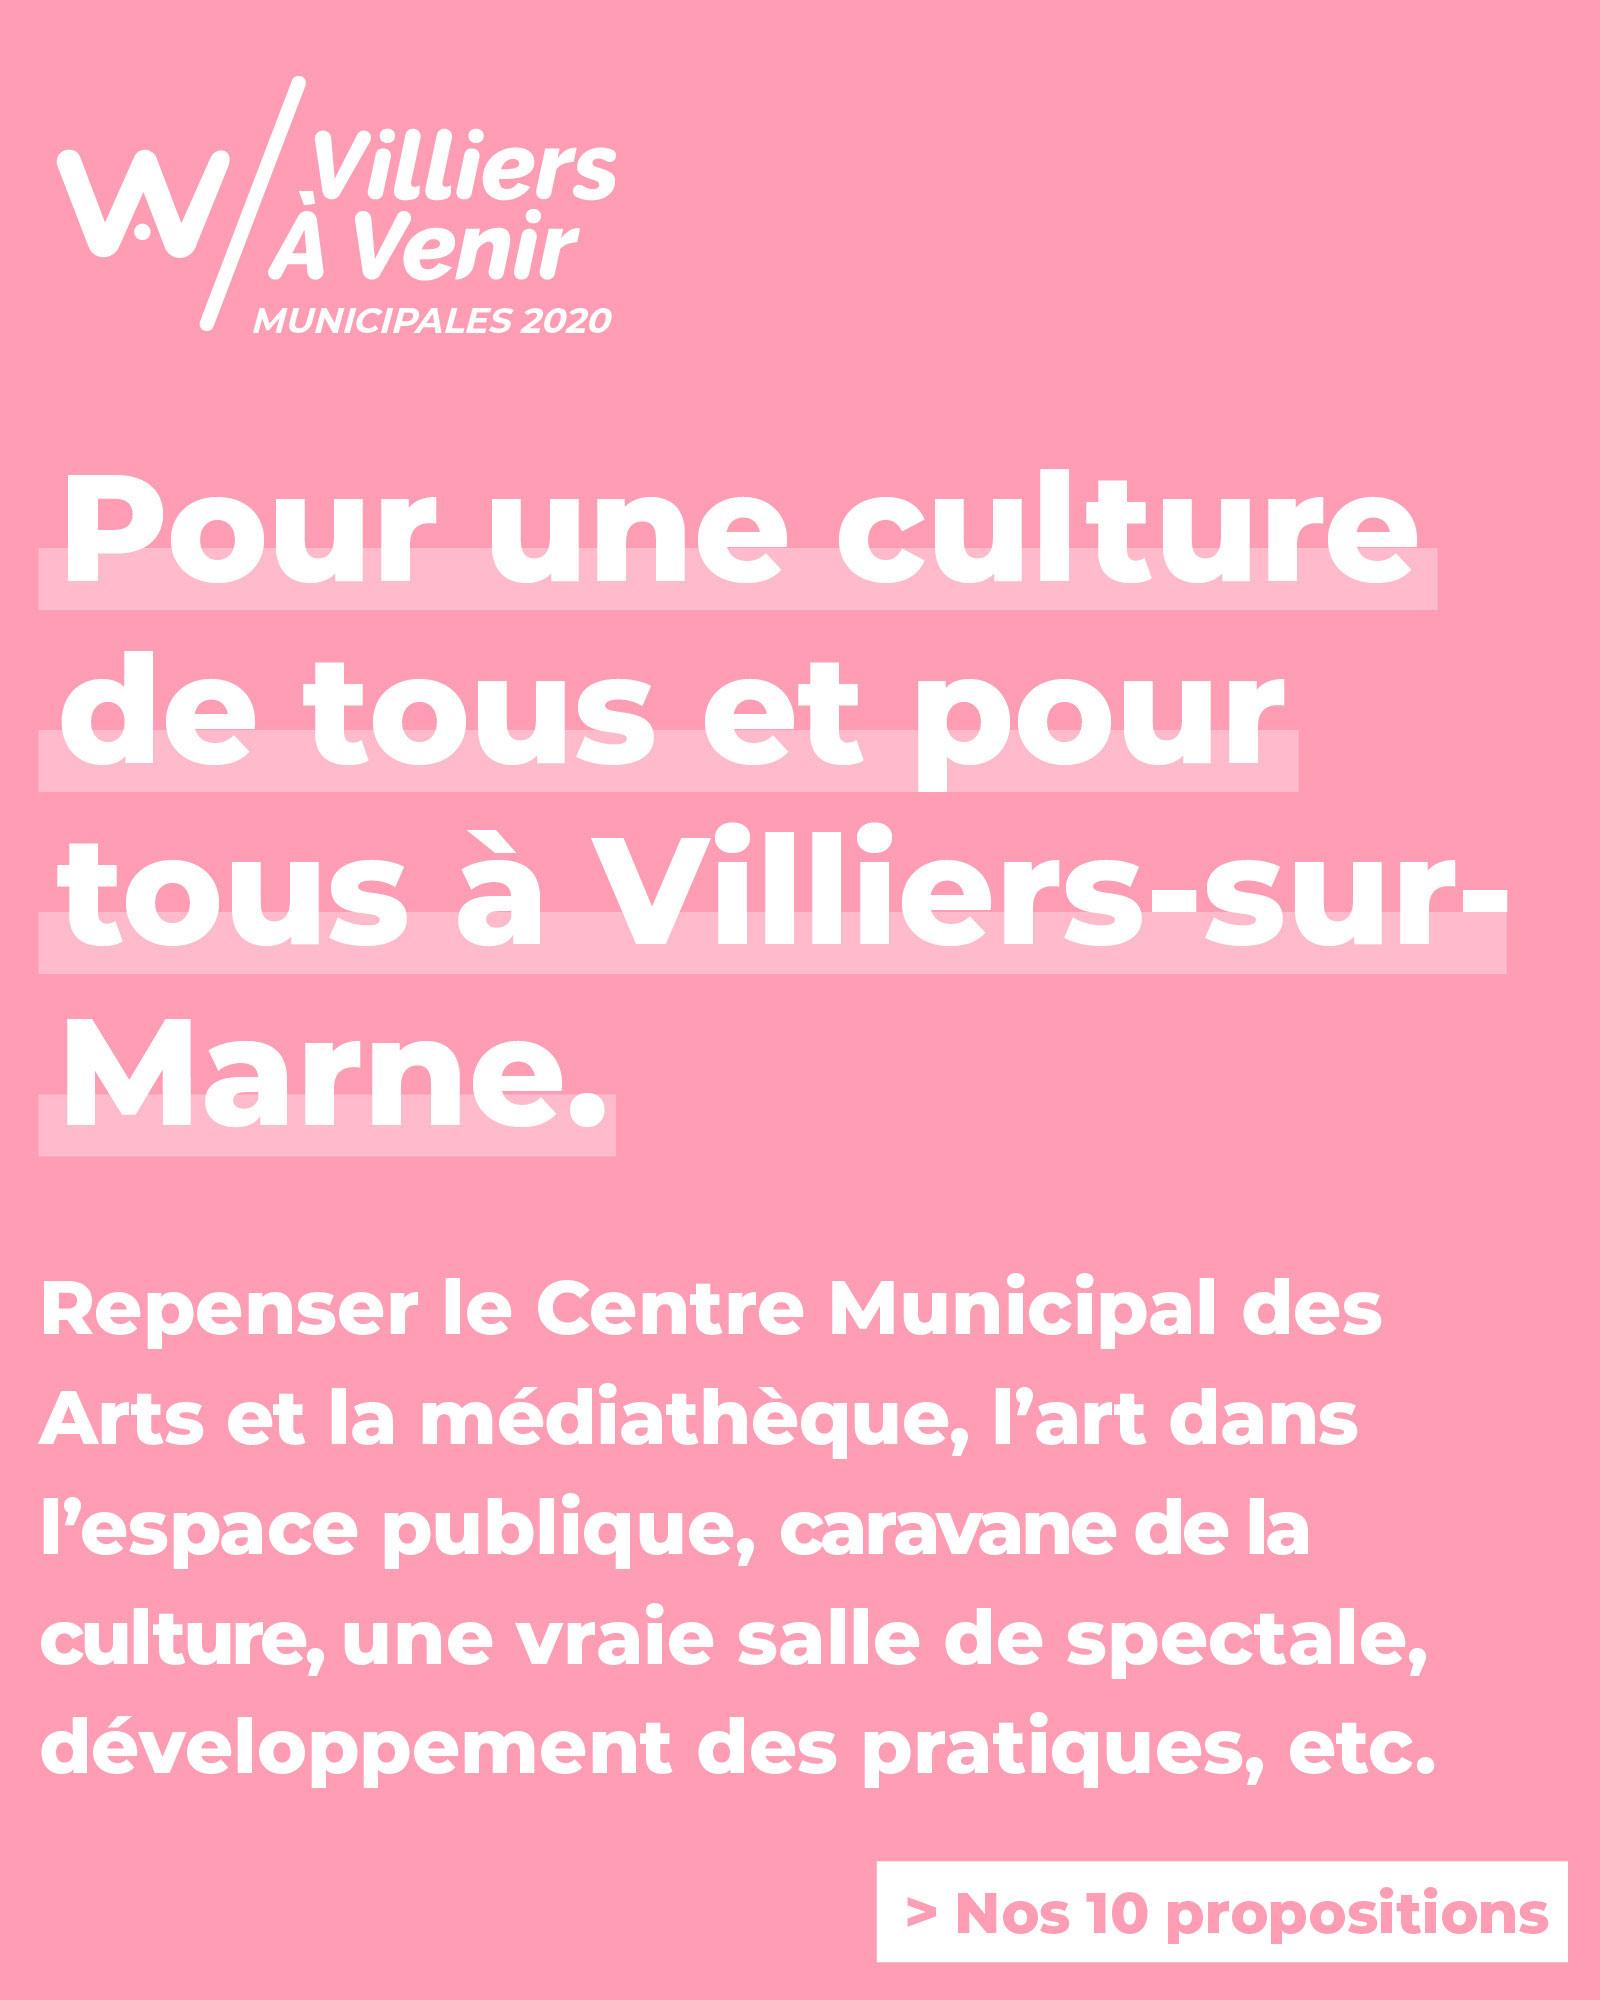 http://vav94.fr/wp-content/uploads/2020/02/CULTURE-PROGRAMME-VILLIERS-SUR-MARNE-MUNICIPALES-2020-VILLIERS-A-VENIR-VAV.jpg